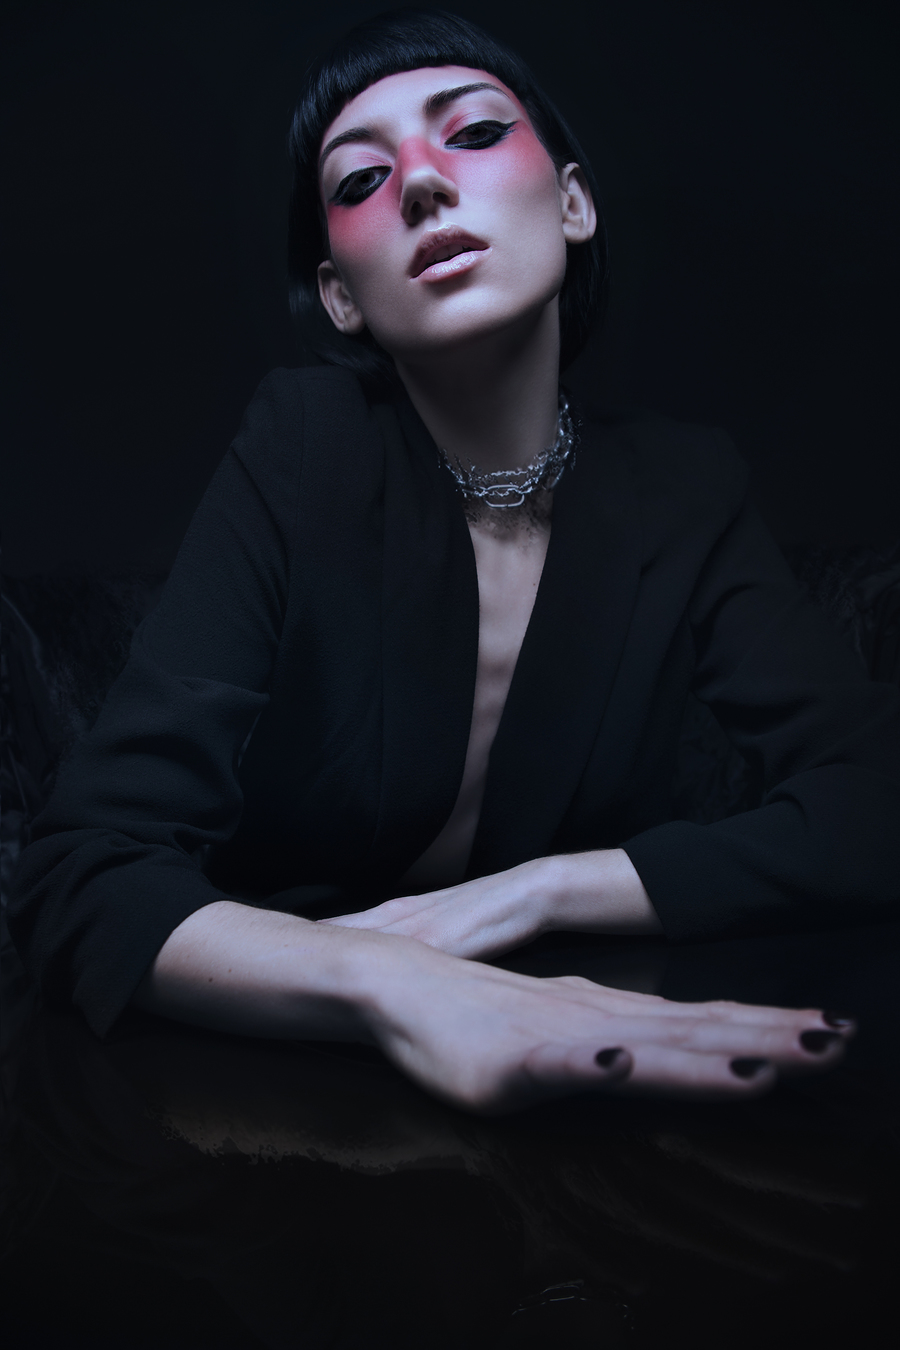 Model Jordan Ebbitt Model / Uploaded 27th March 2019 @ 03:33 PM